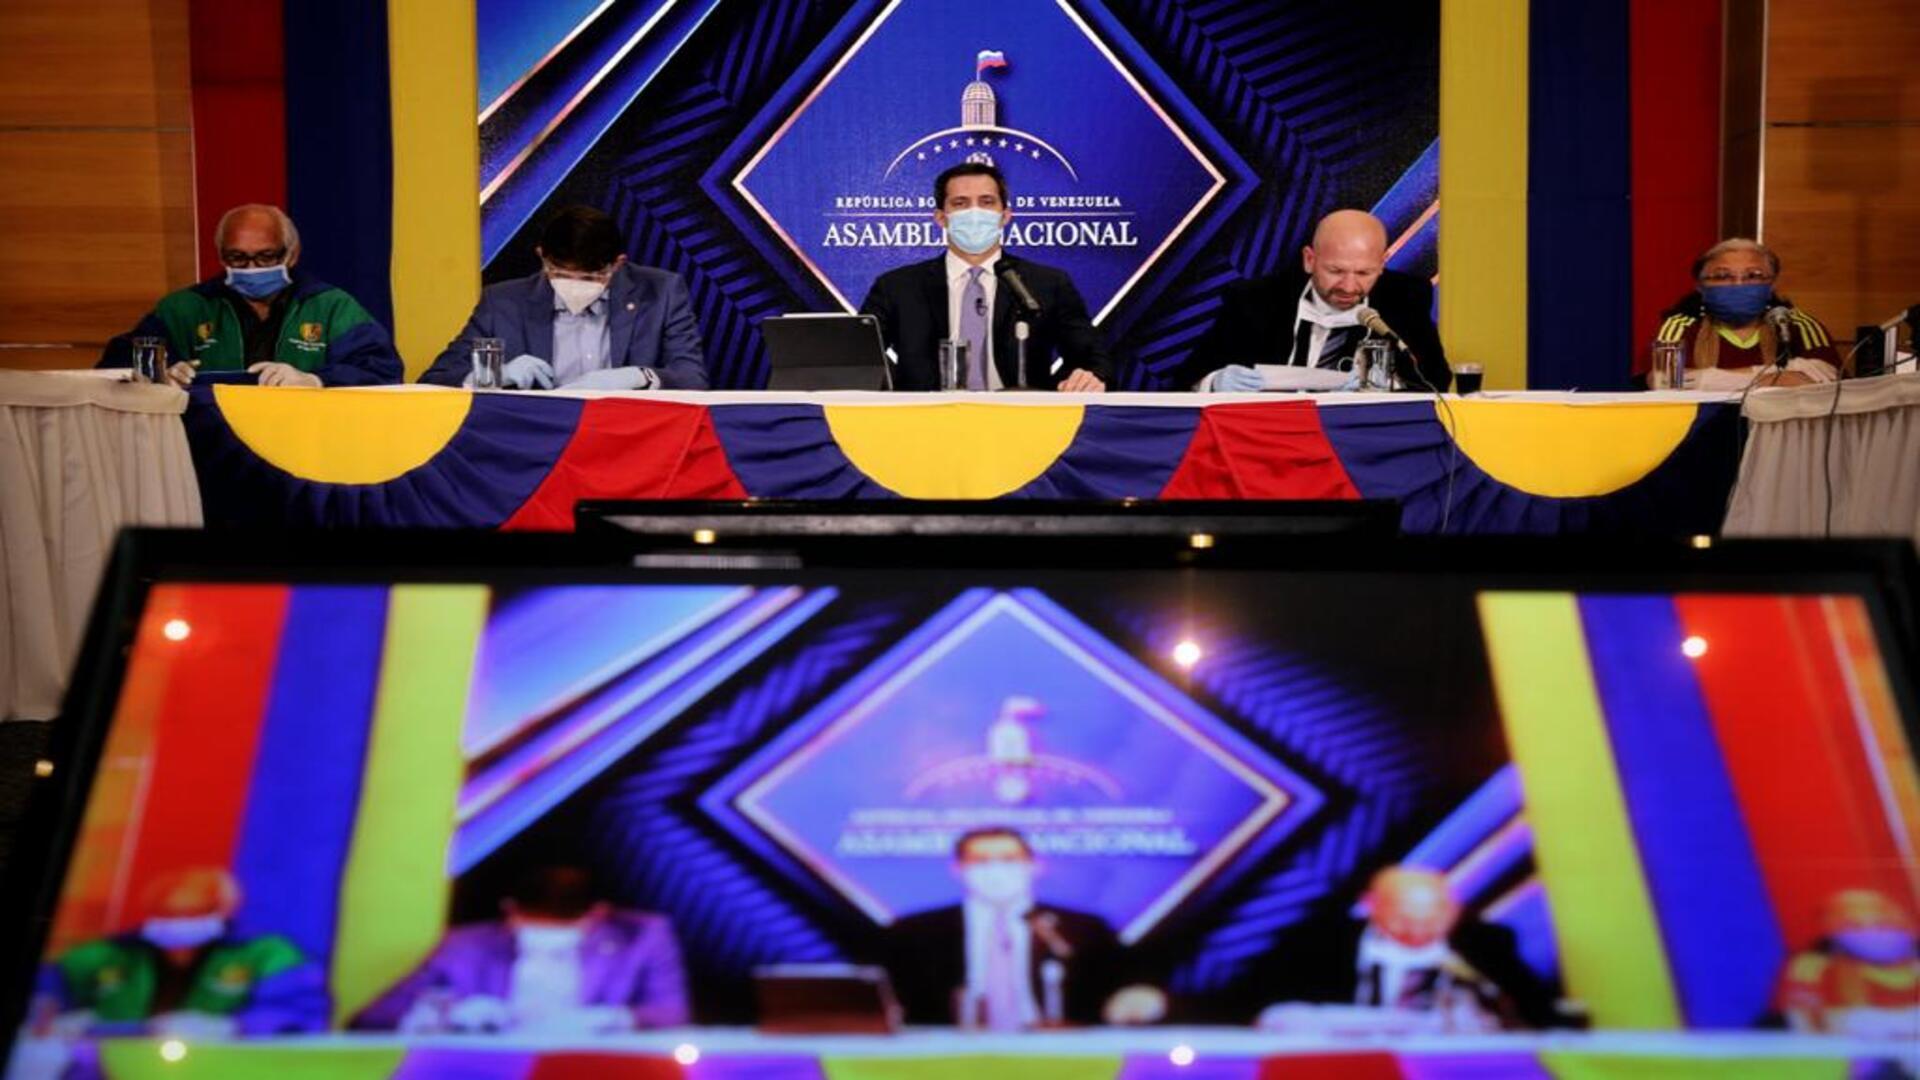 Asamblea Nacional modifica las preguntas de la consulta popular